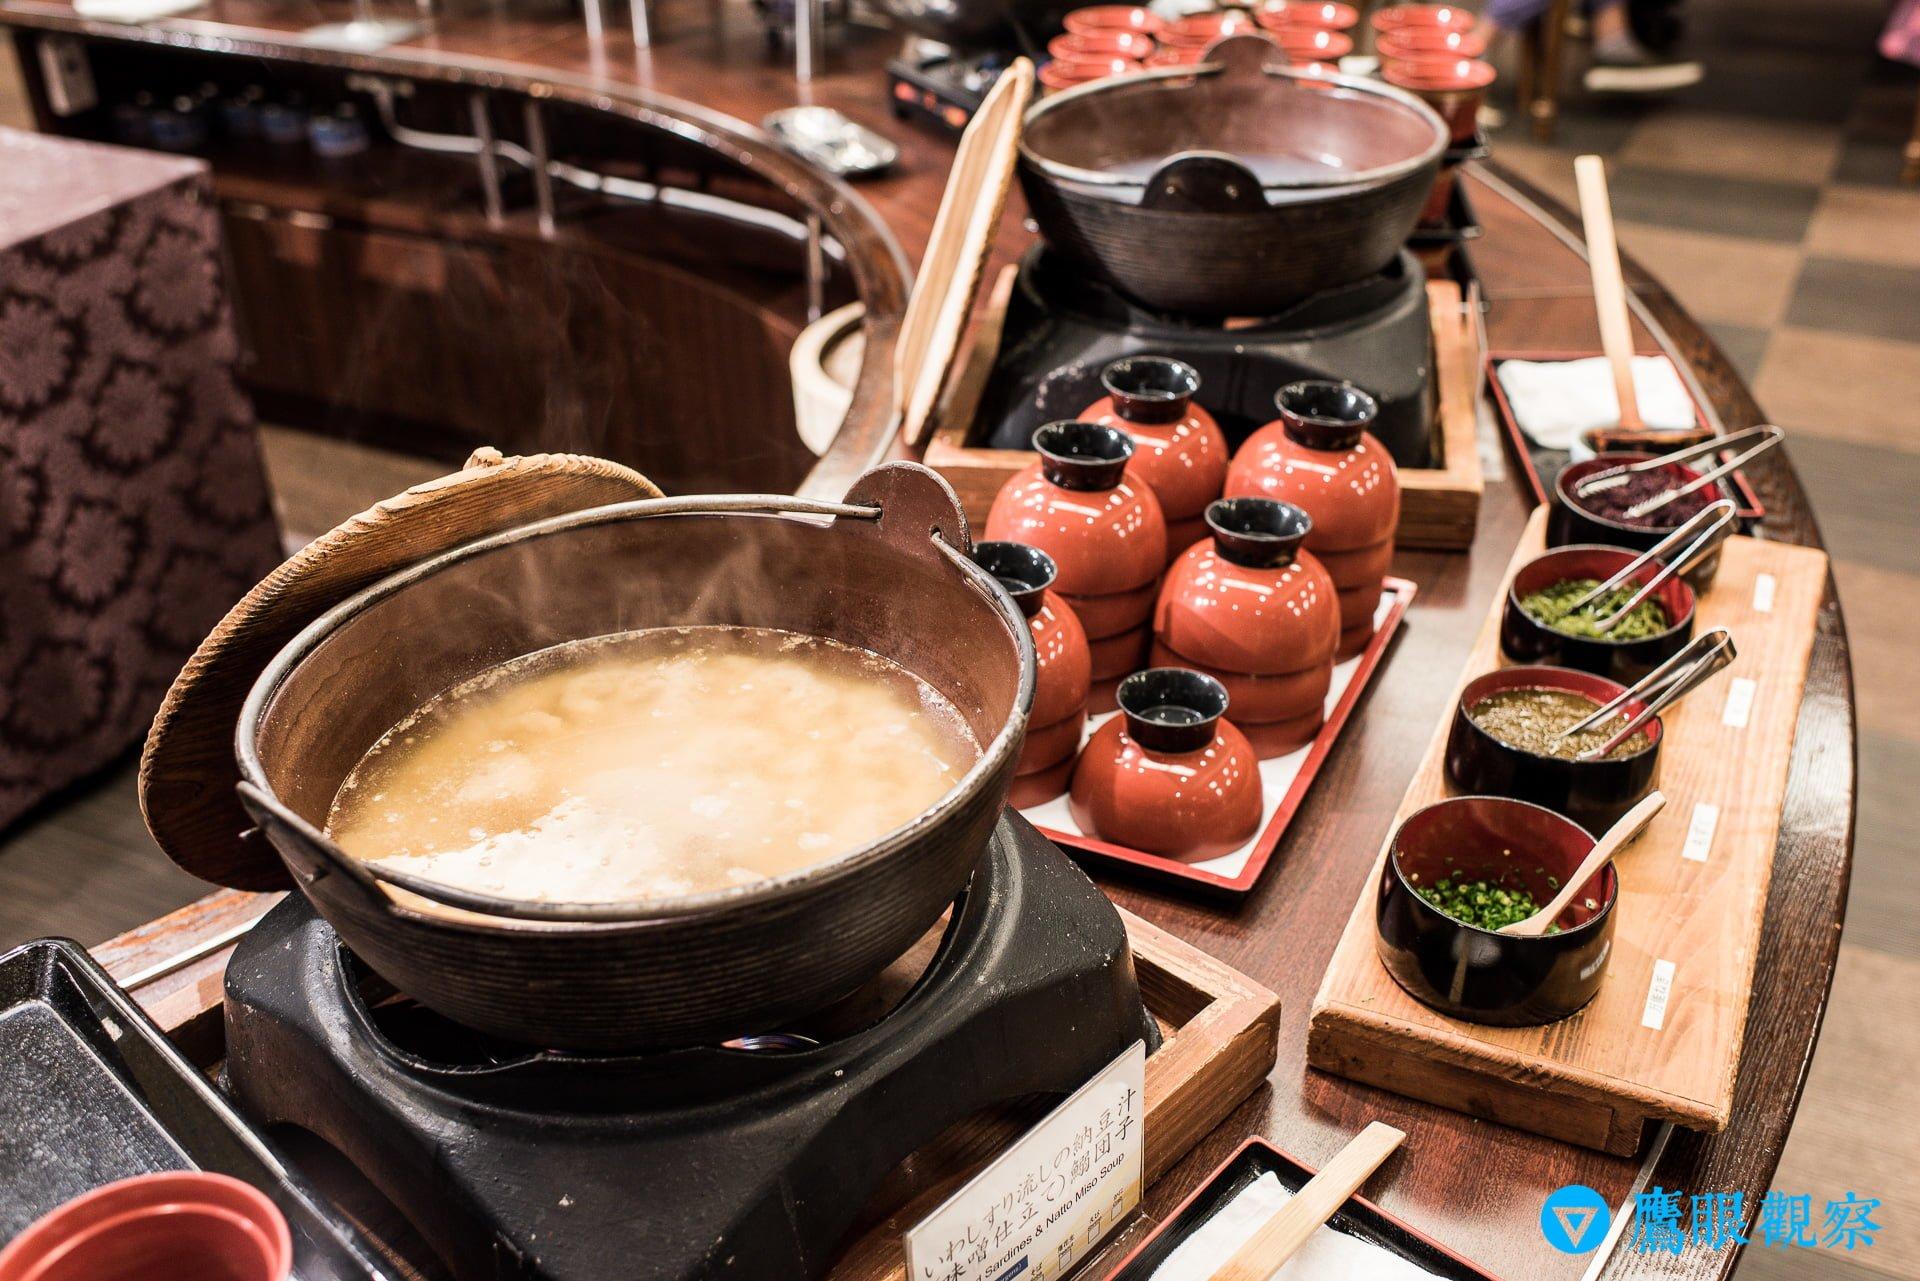 Travel Oarai Hotel in Ibaraki Prefecture Japan 36 日本茨城縣/東茨城/大洗飯店(大洗ホテル)/旅館推薦與住宿旅遊心得分享